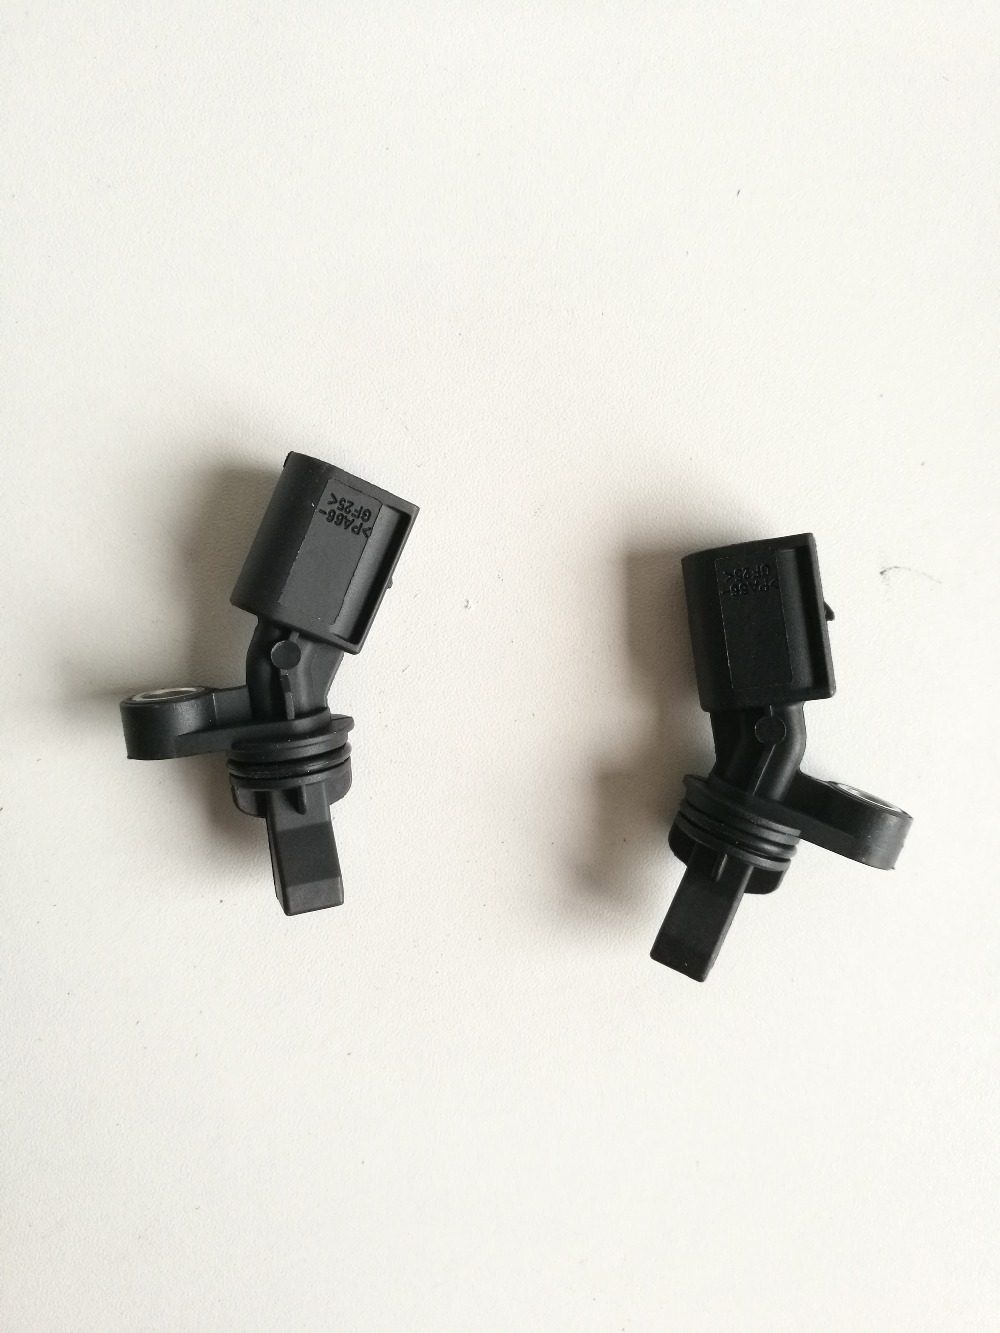 1 pcs 2H0927807A and 1 pcs 2H0927808A Rear Left Right ABS Sensor Wheel Speed Sensor for Audi Volkswagen Amarok pickup 2010-2019